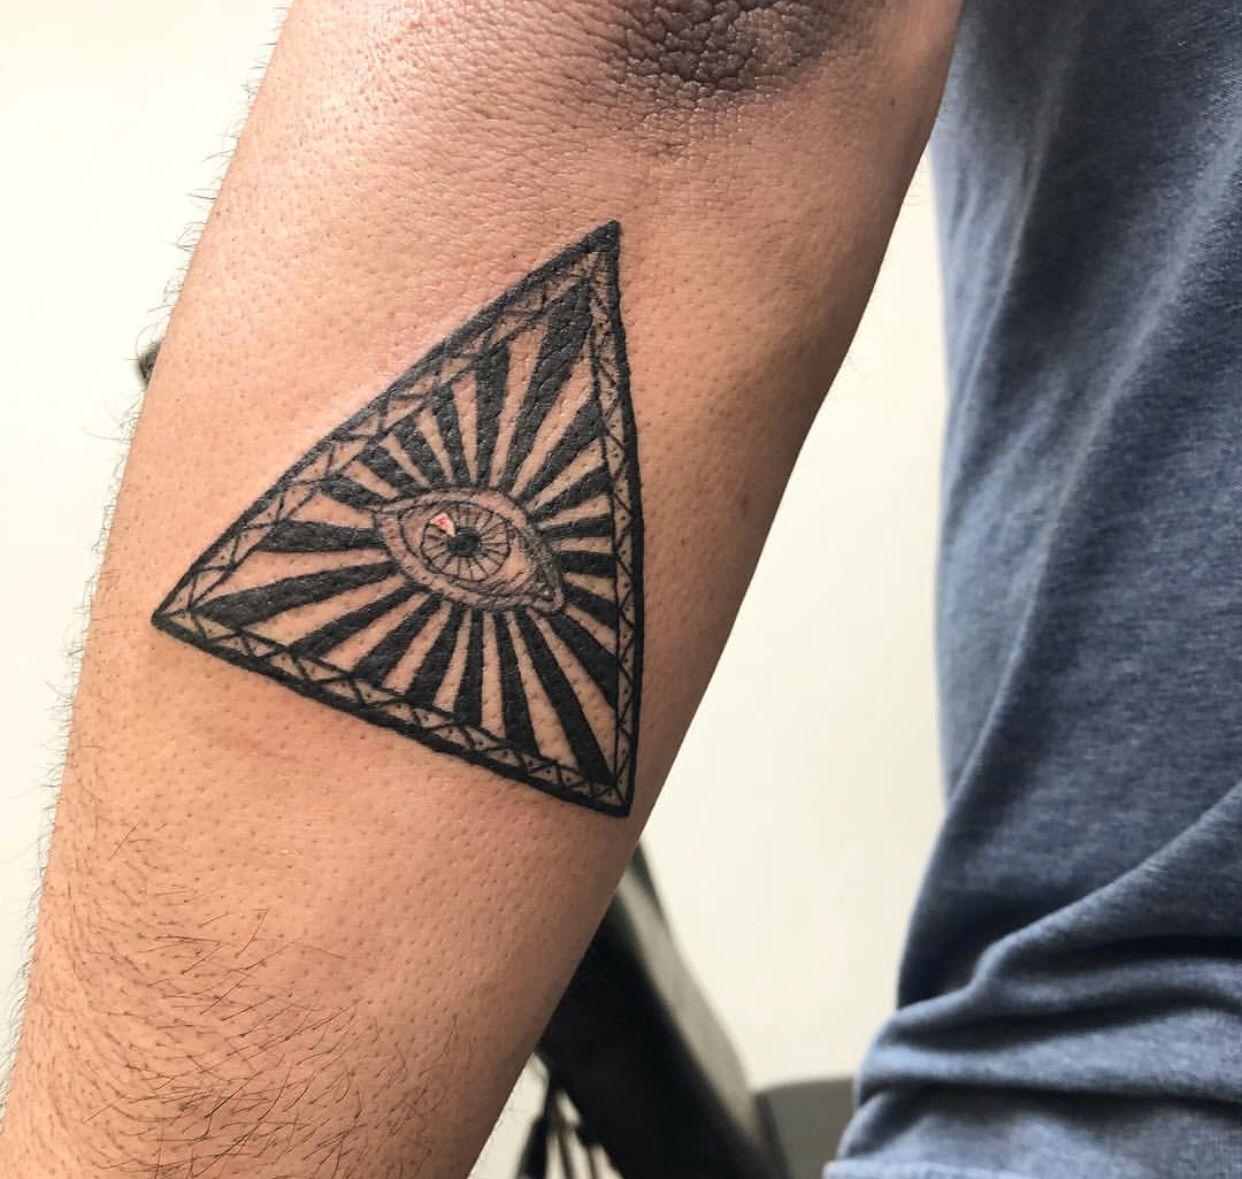 All Seeing Eye Tattoo